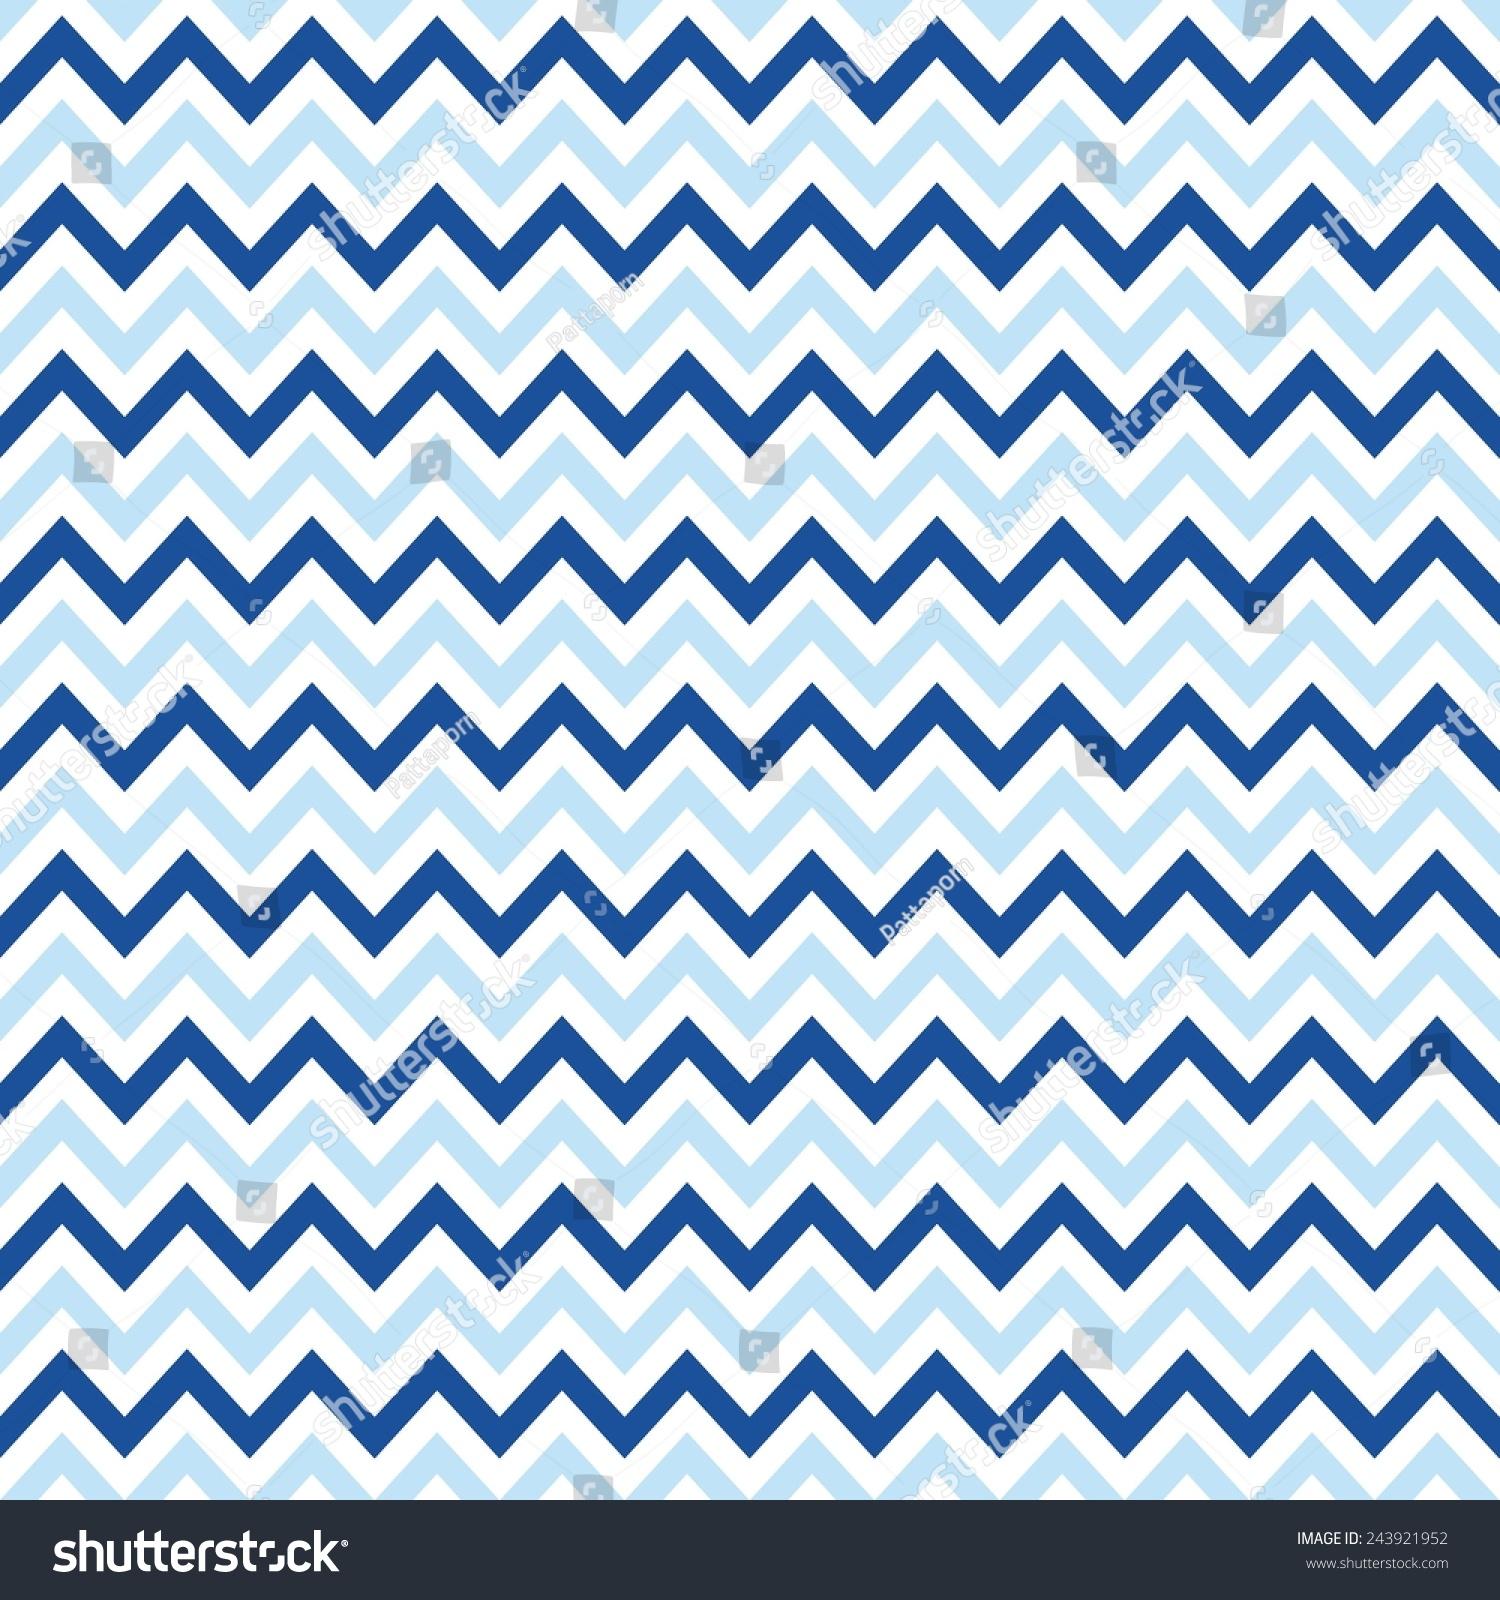 blue digital paper blue - photo #21